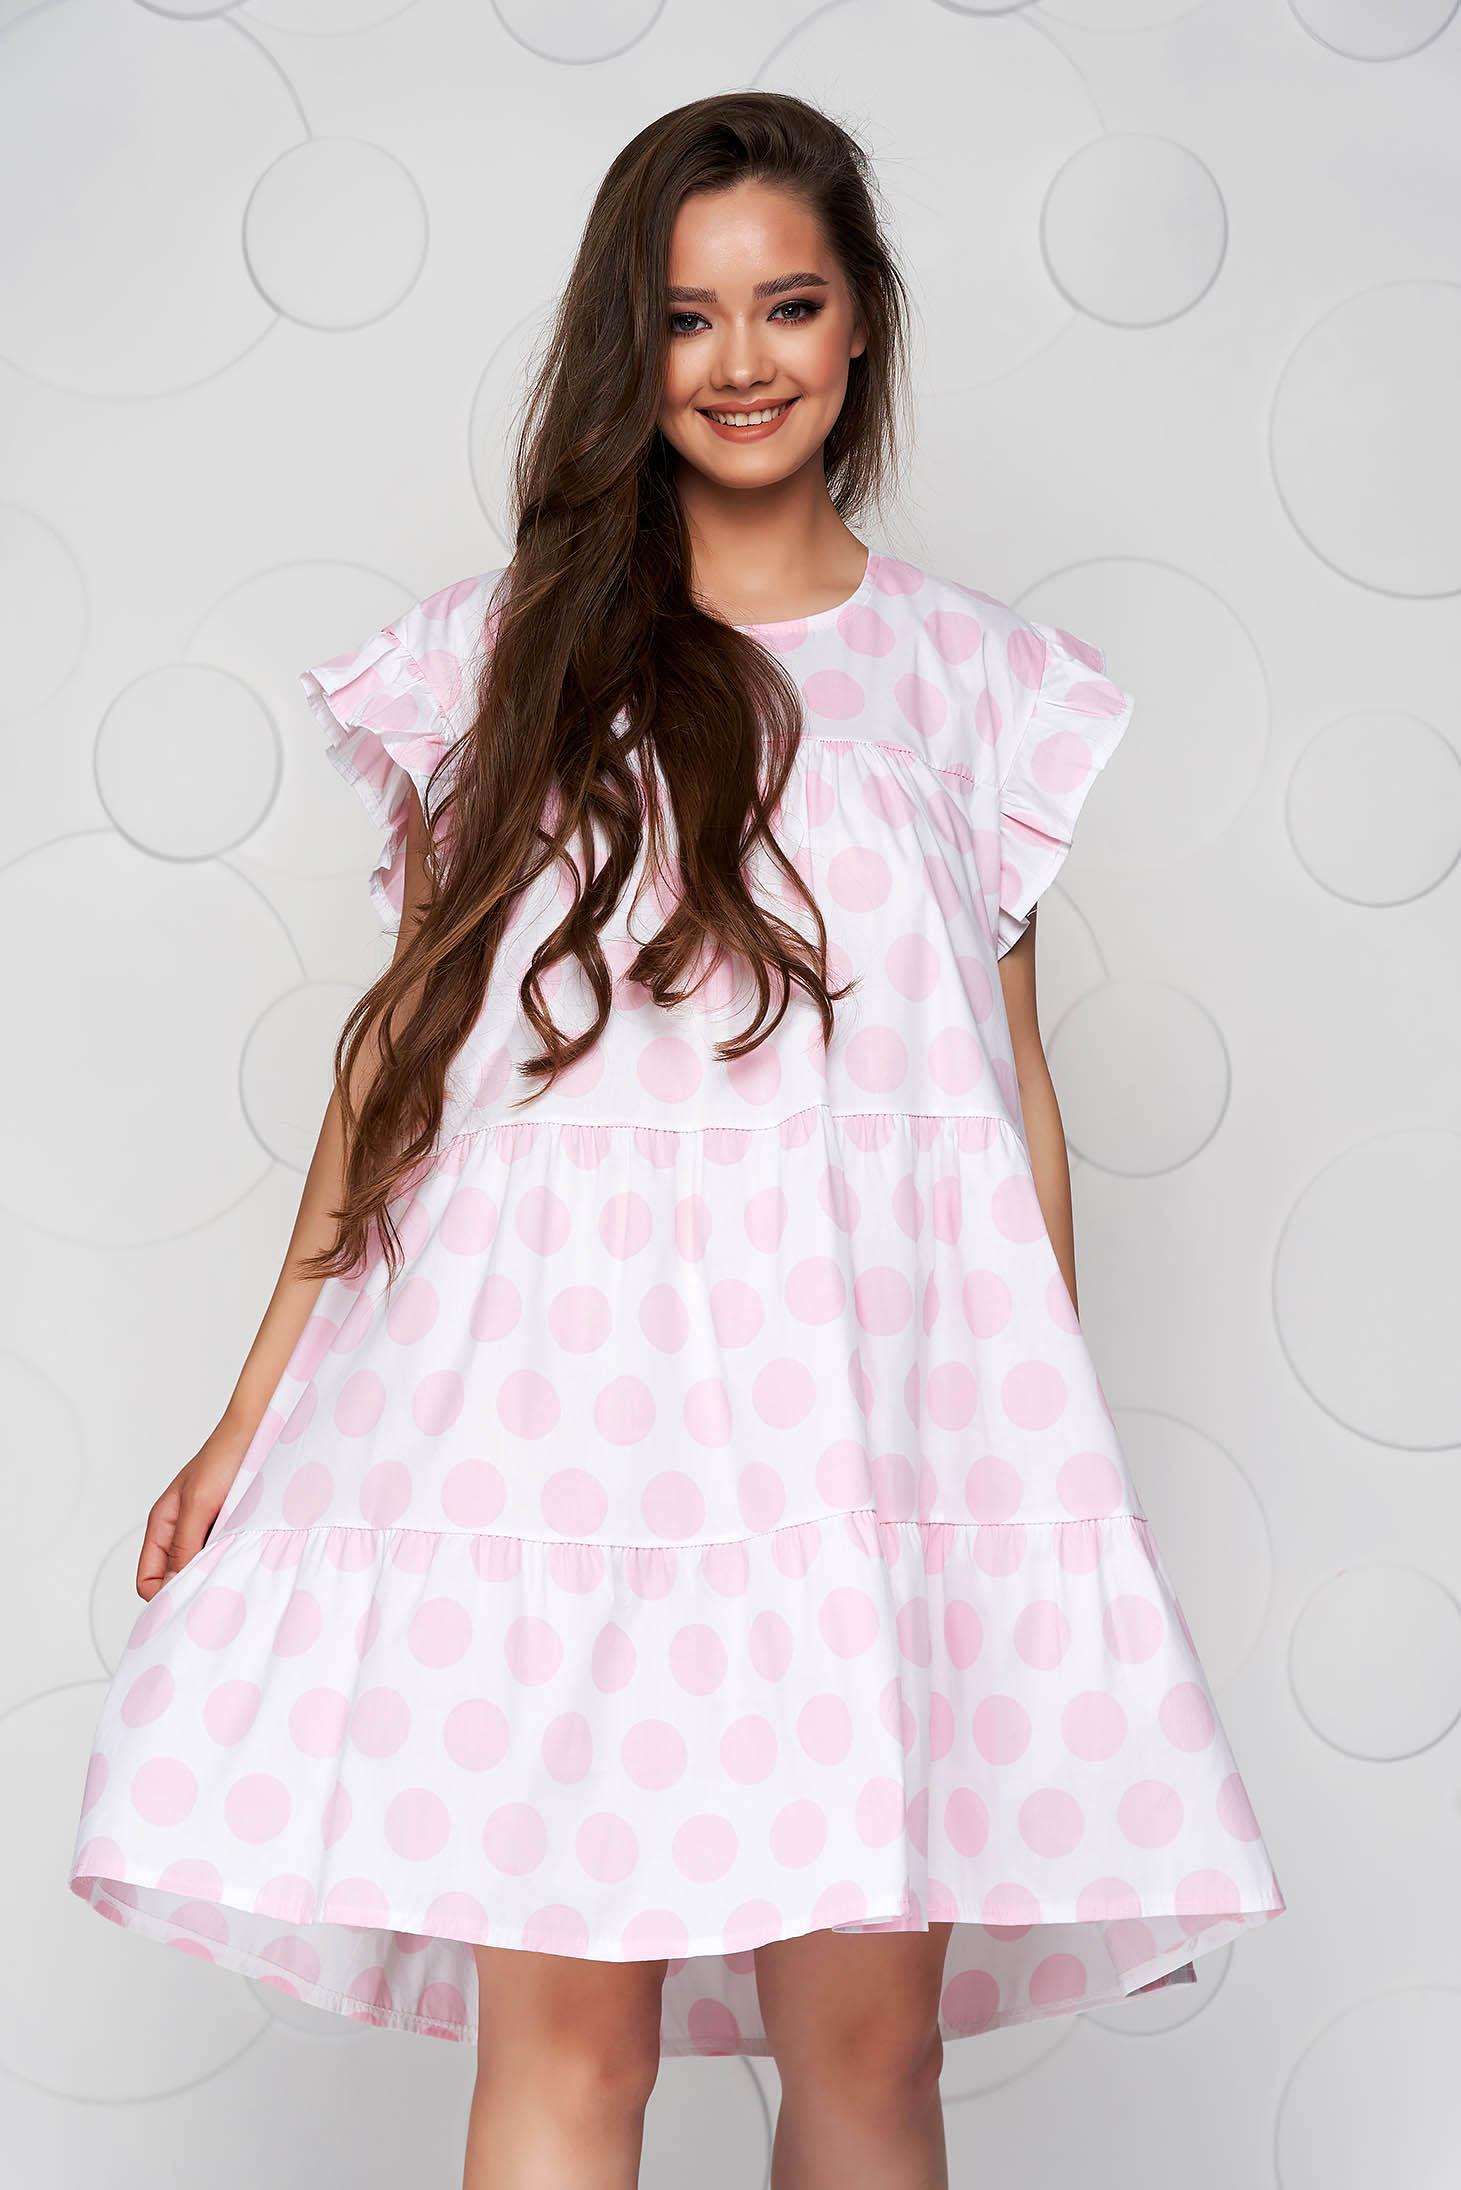 Lightpink dress dots print loose fit with ruffle details short cut poplin, thin cotton